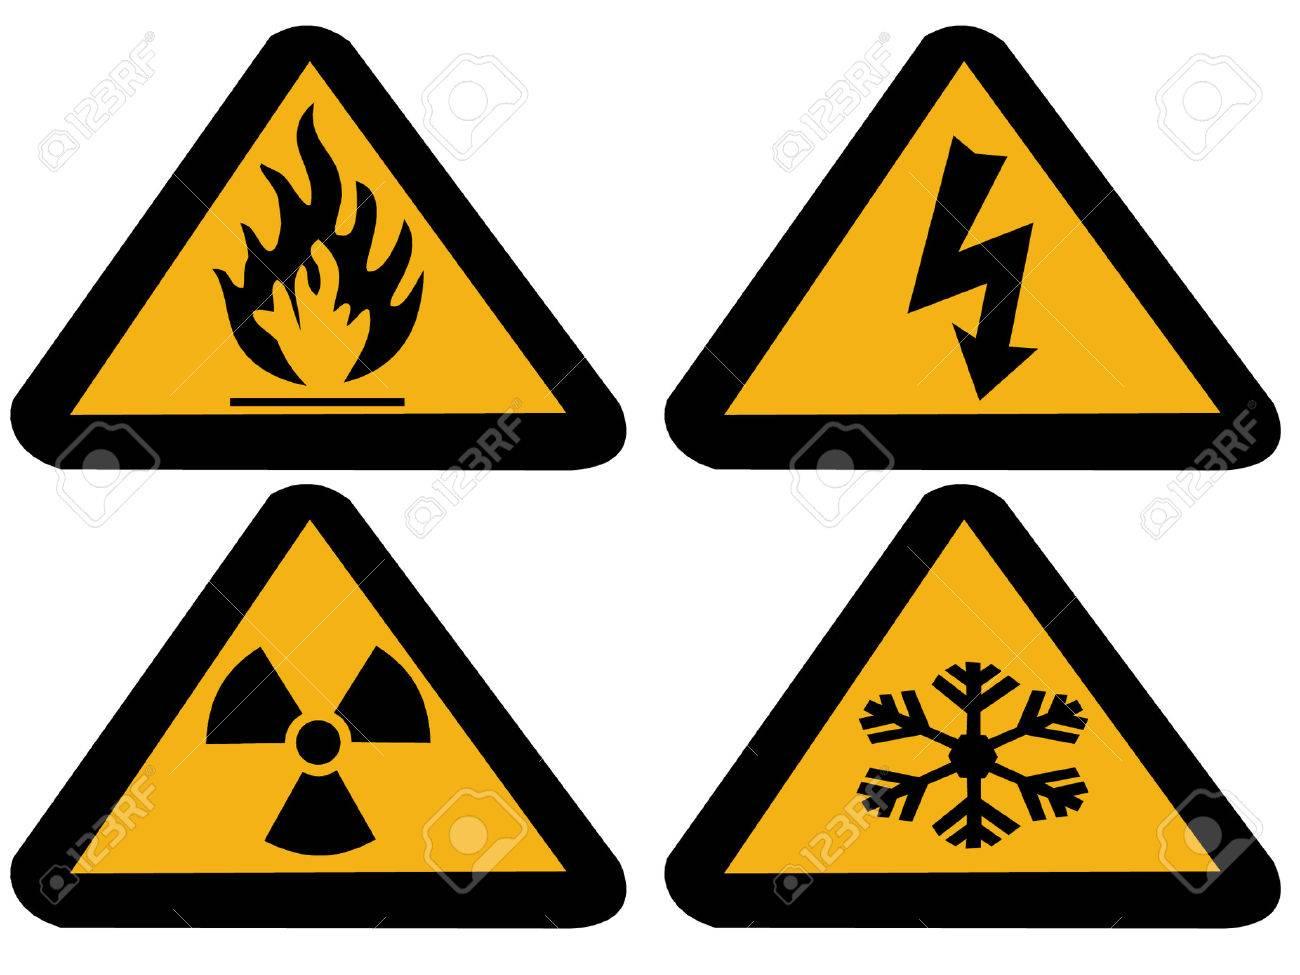 Industrial Hazard Symbols Extreme Cold Flammableradioactive